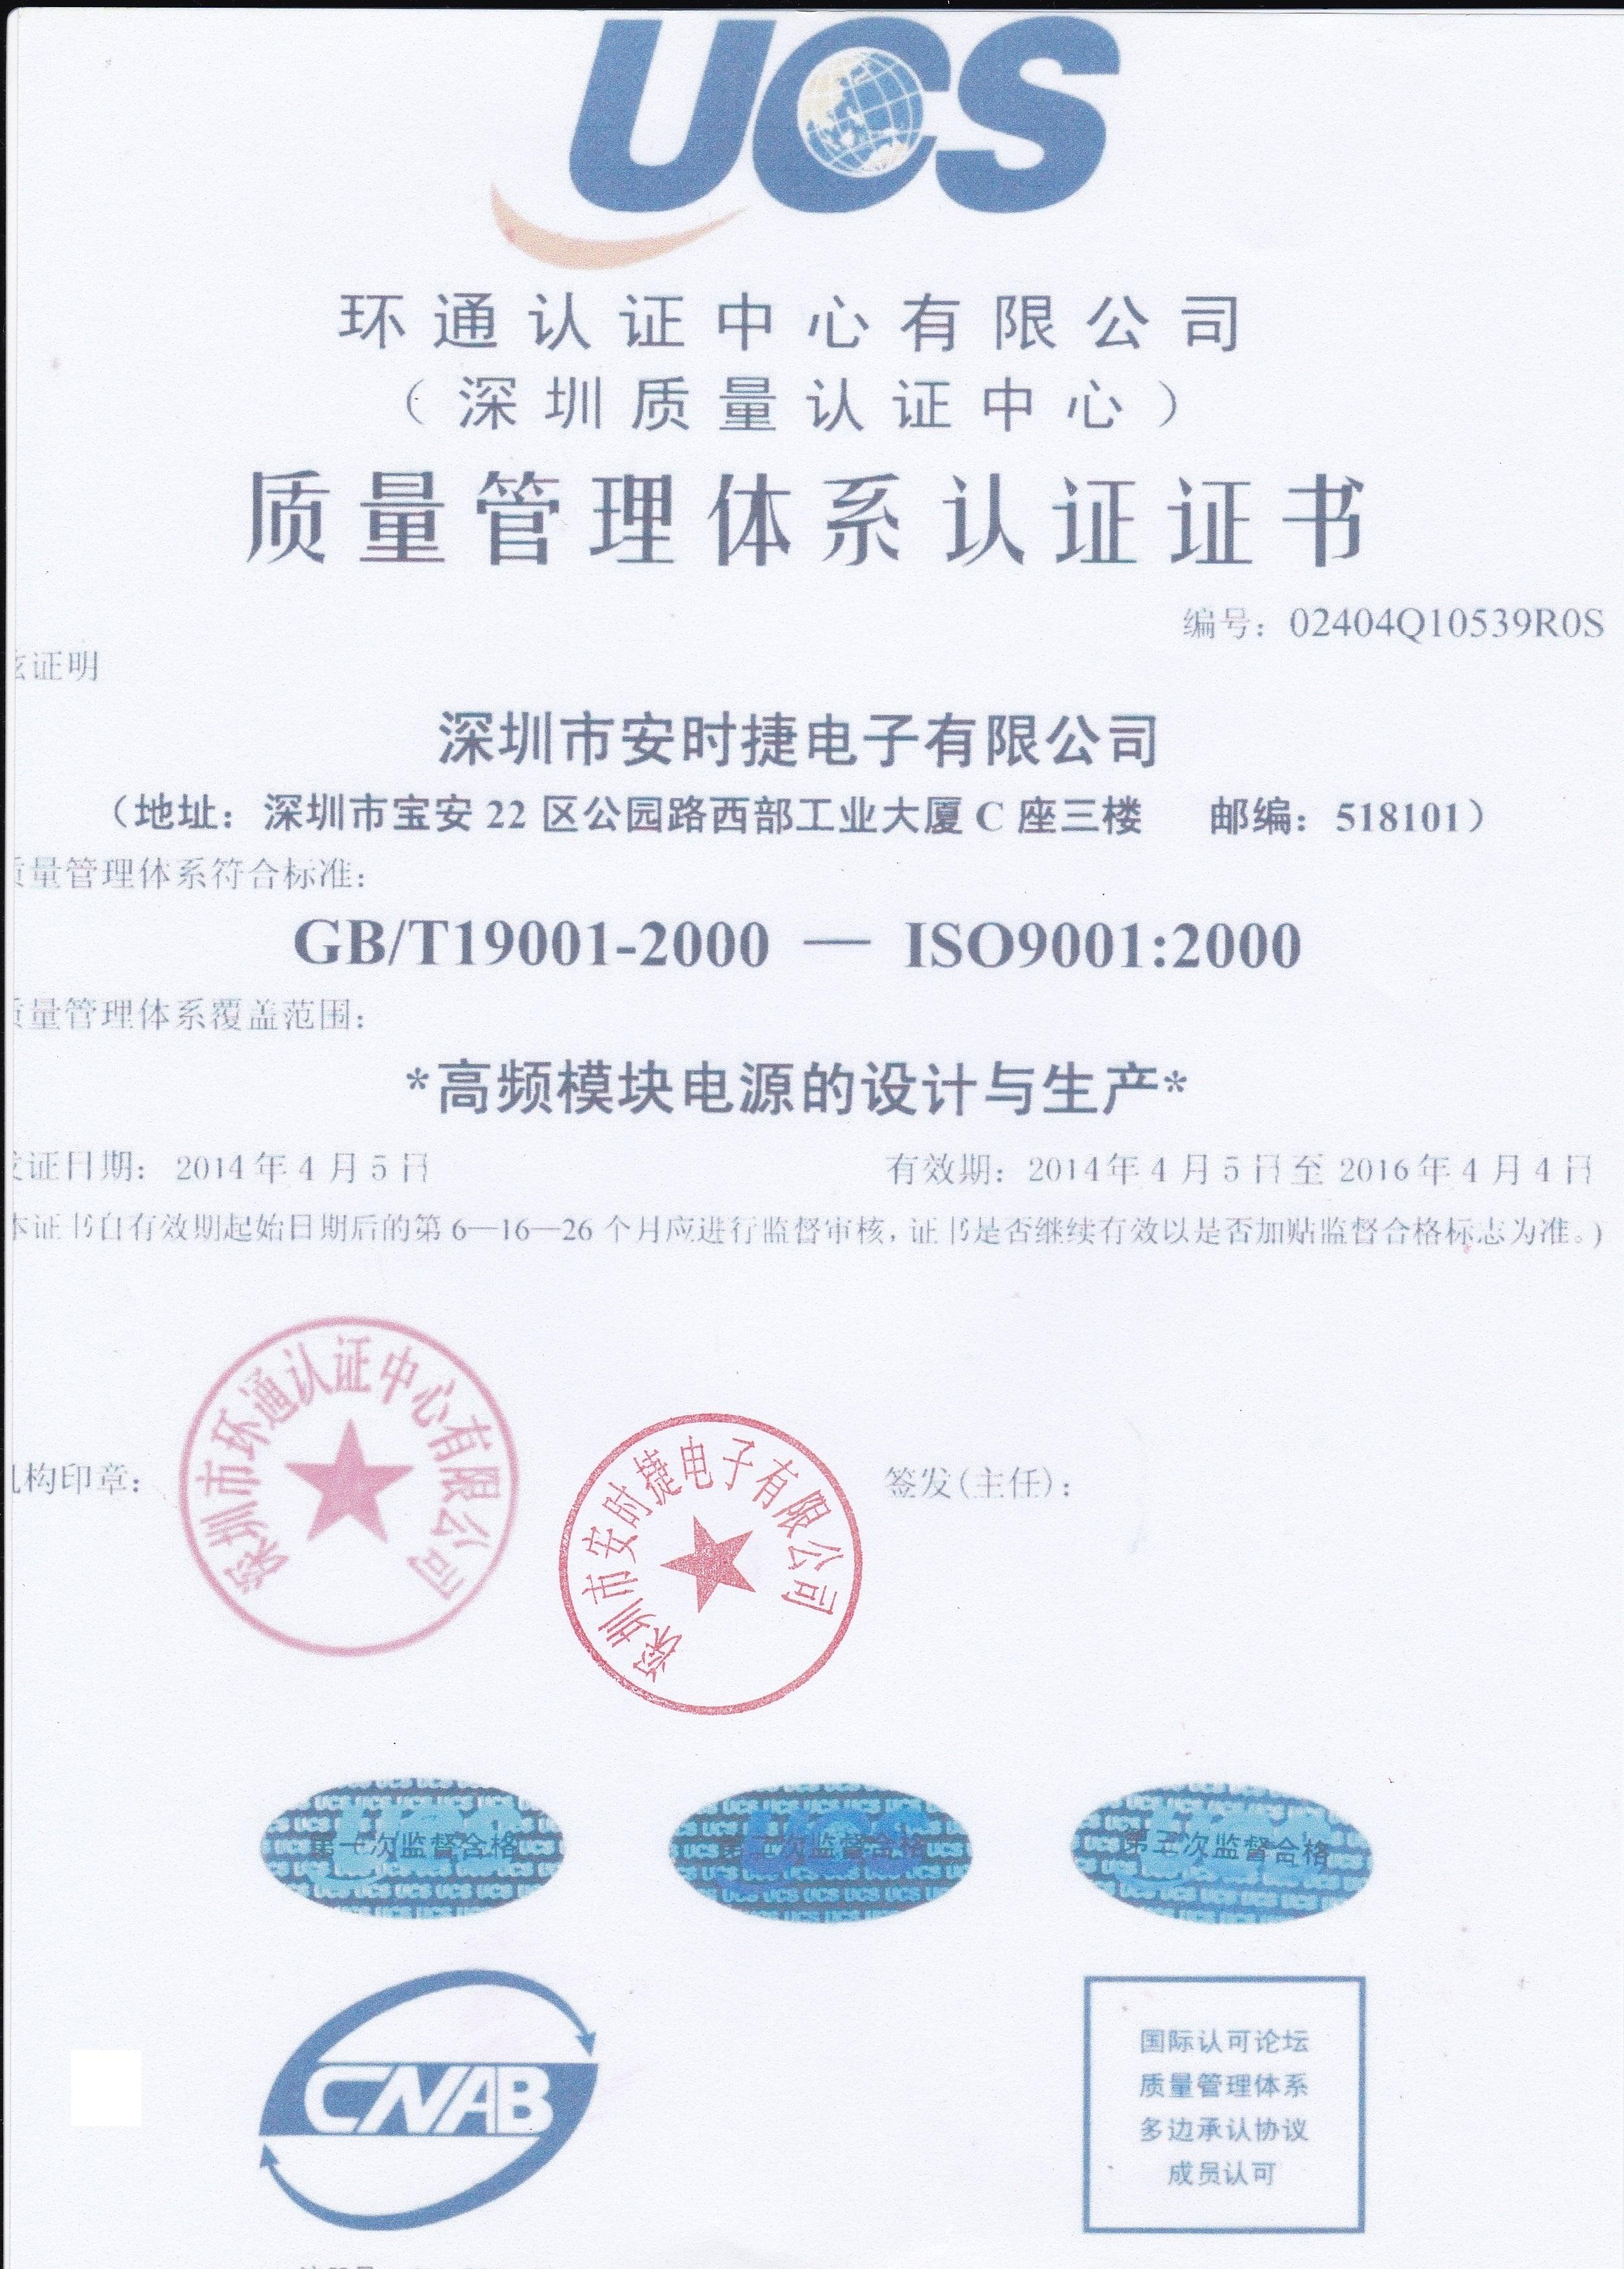 HAD10-05V24-NFCI ANSJ代替 Harevst AC-DC 10W 双路降压电源模块